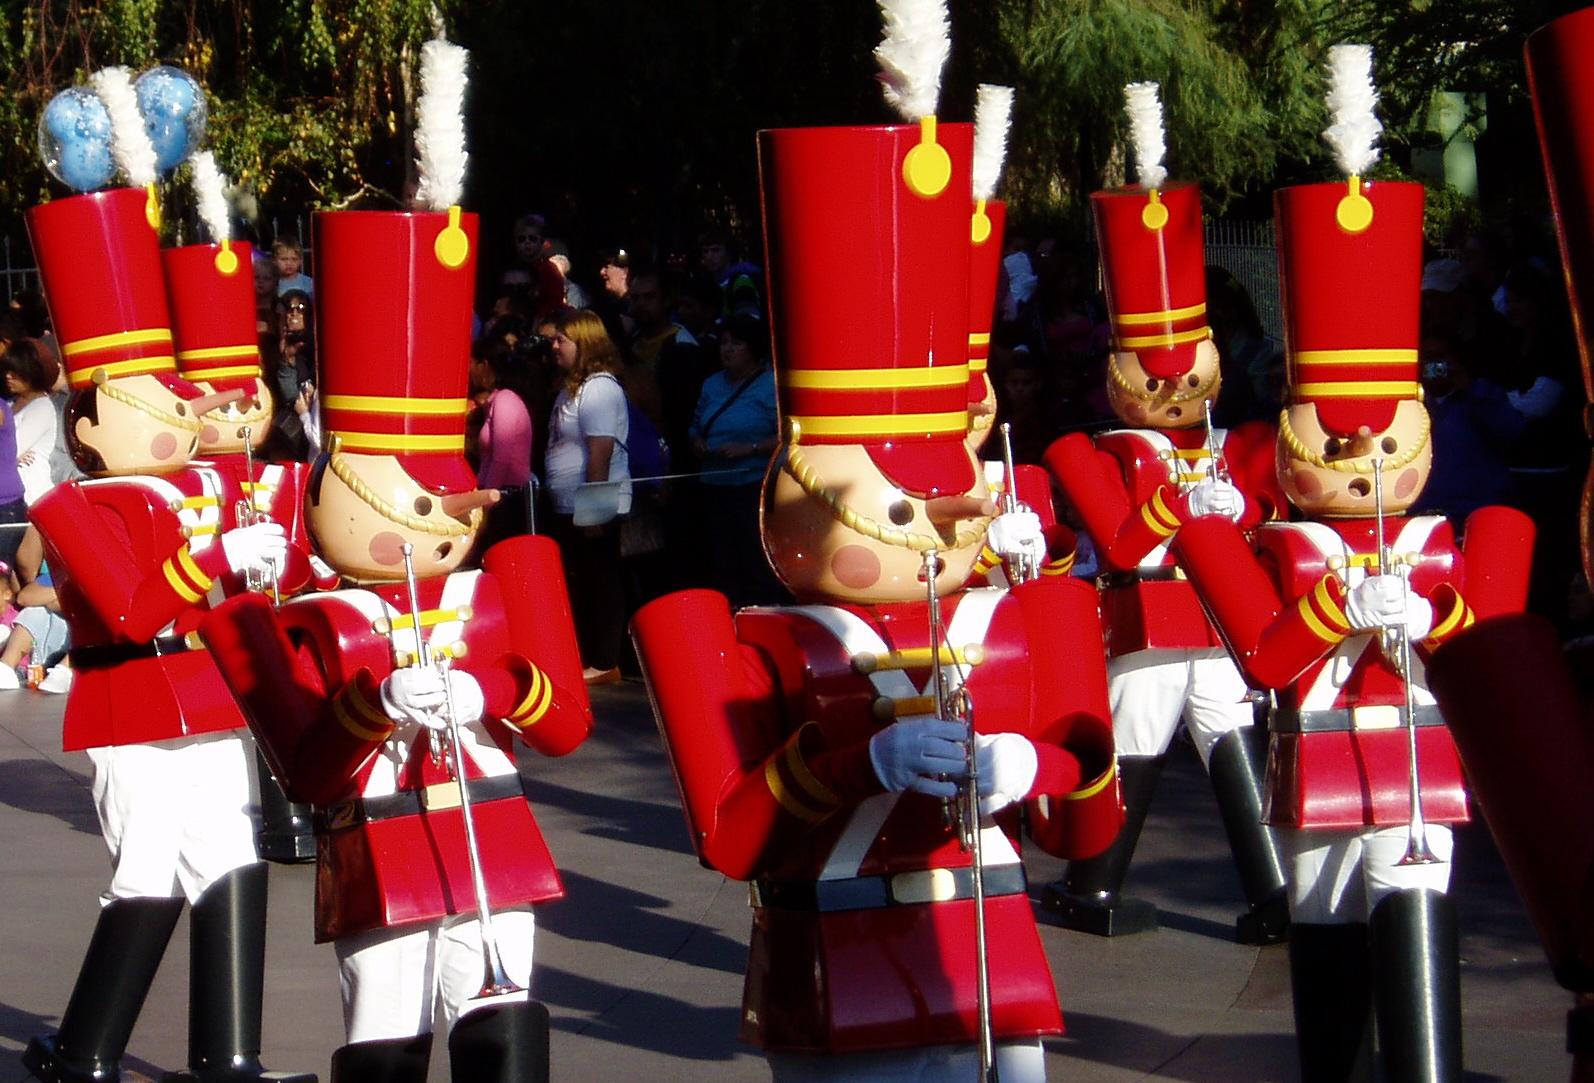 Ordinary Marching Band Christmas Ornaments Part - 3: Marching Band Is For Christmas, Right?